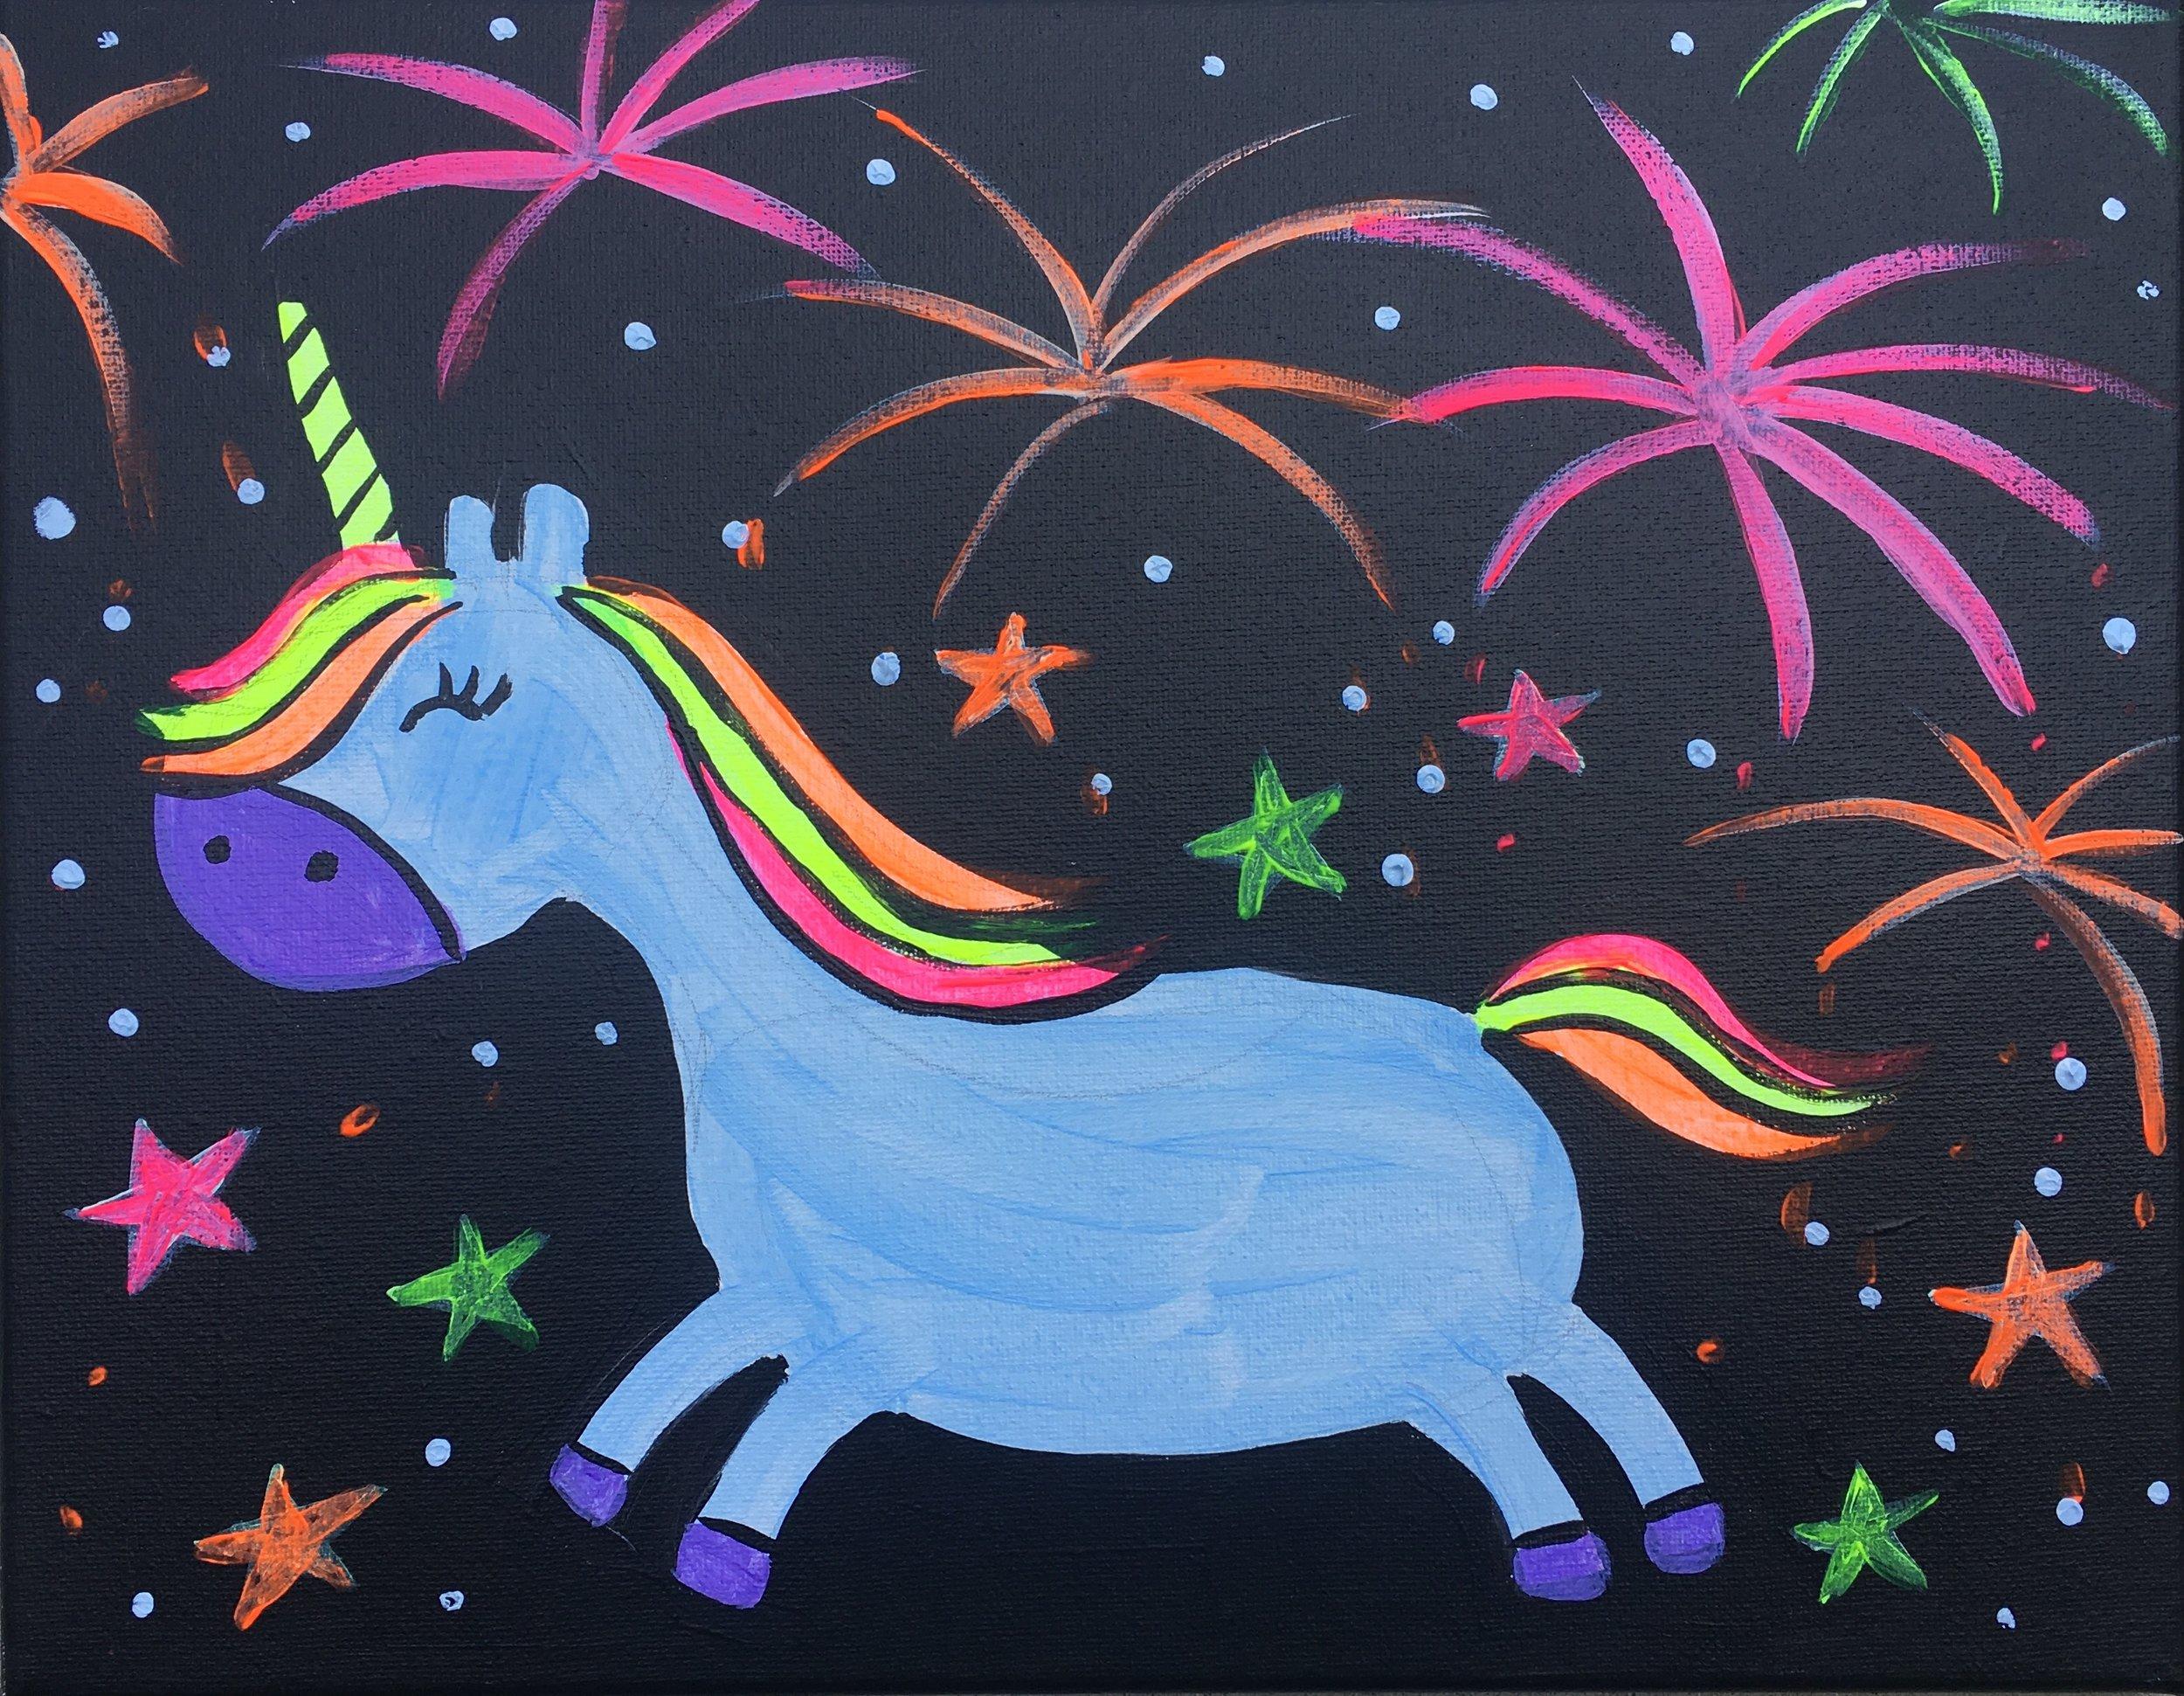 Unicorn & Fireworks!